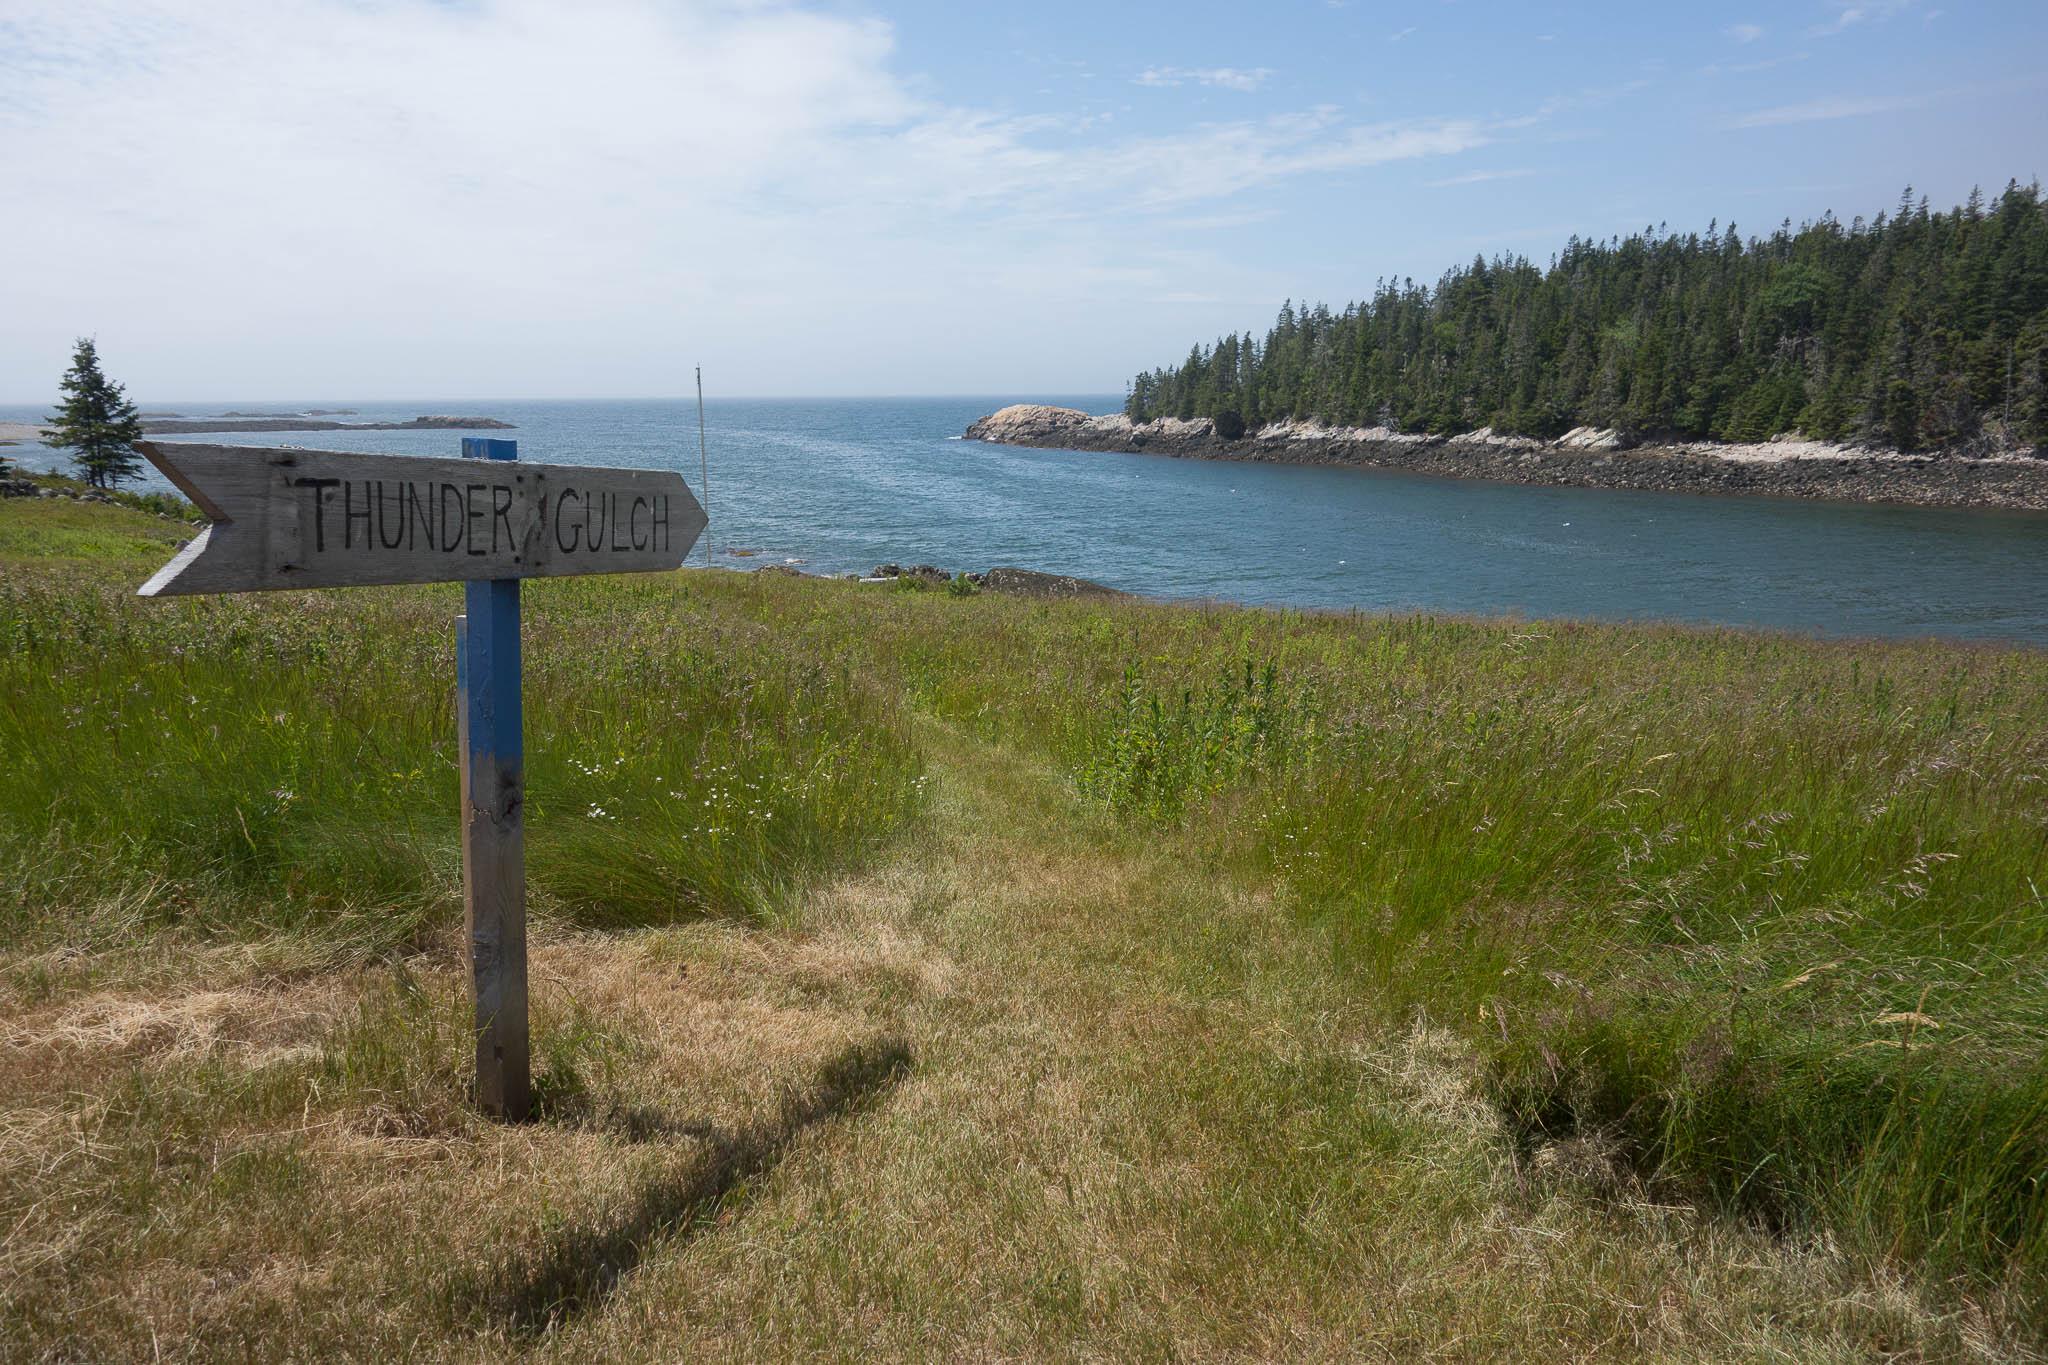 Acadia: Thunder Gulch Trailhead